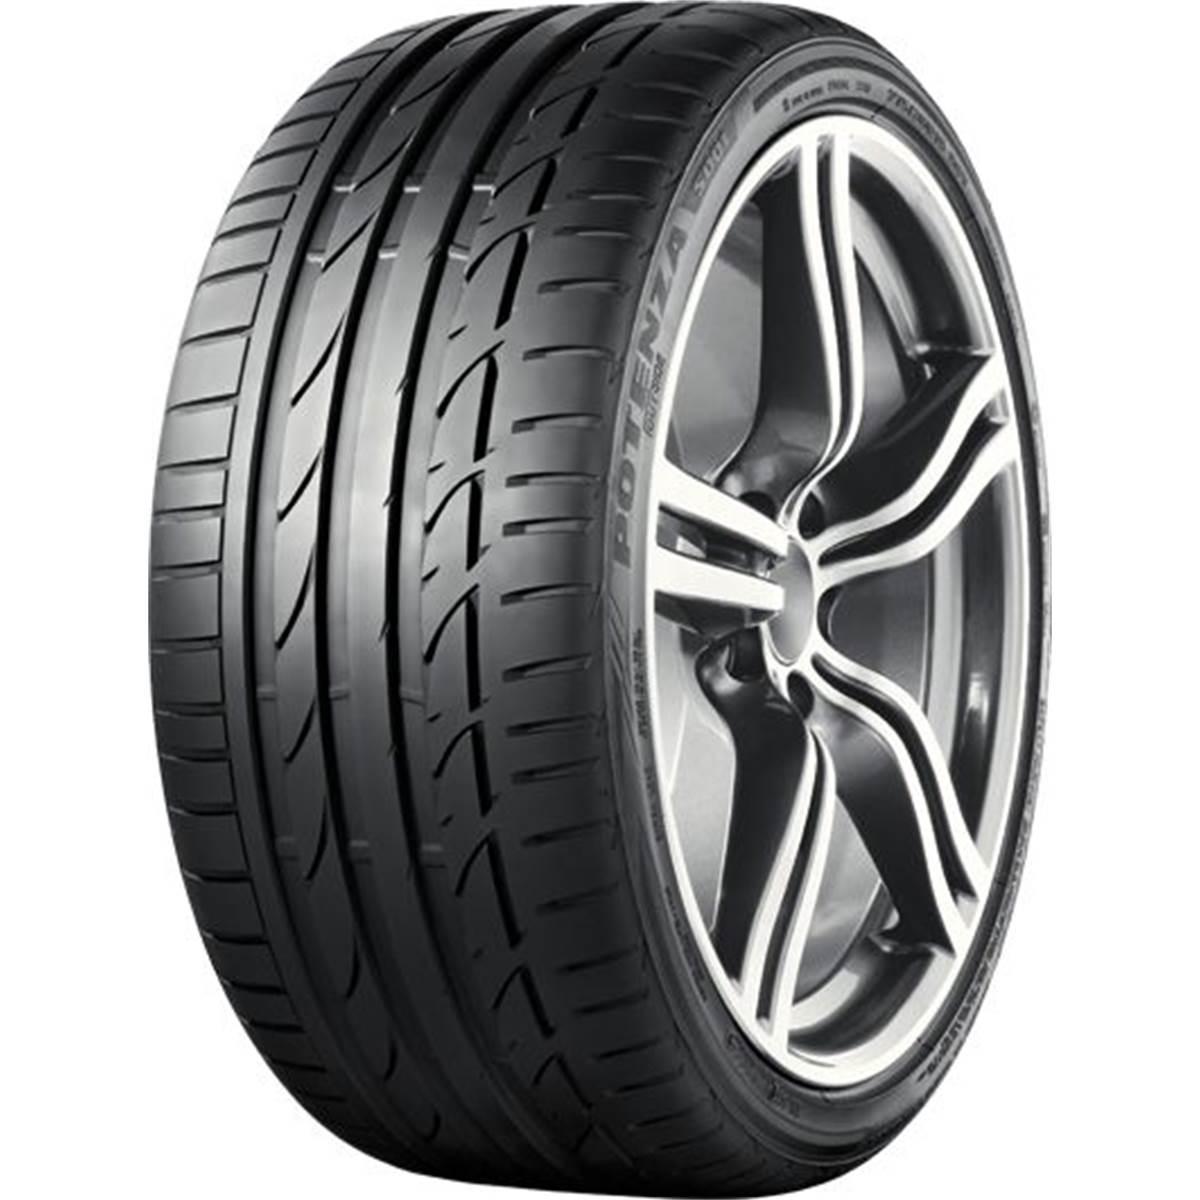 Pneu Bridgestone 235/55R17 99V POTENZA S001